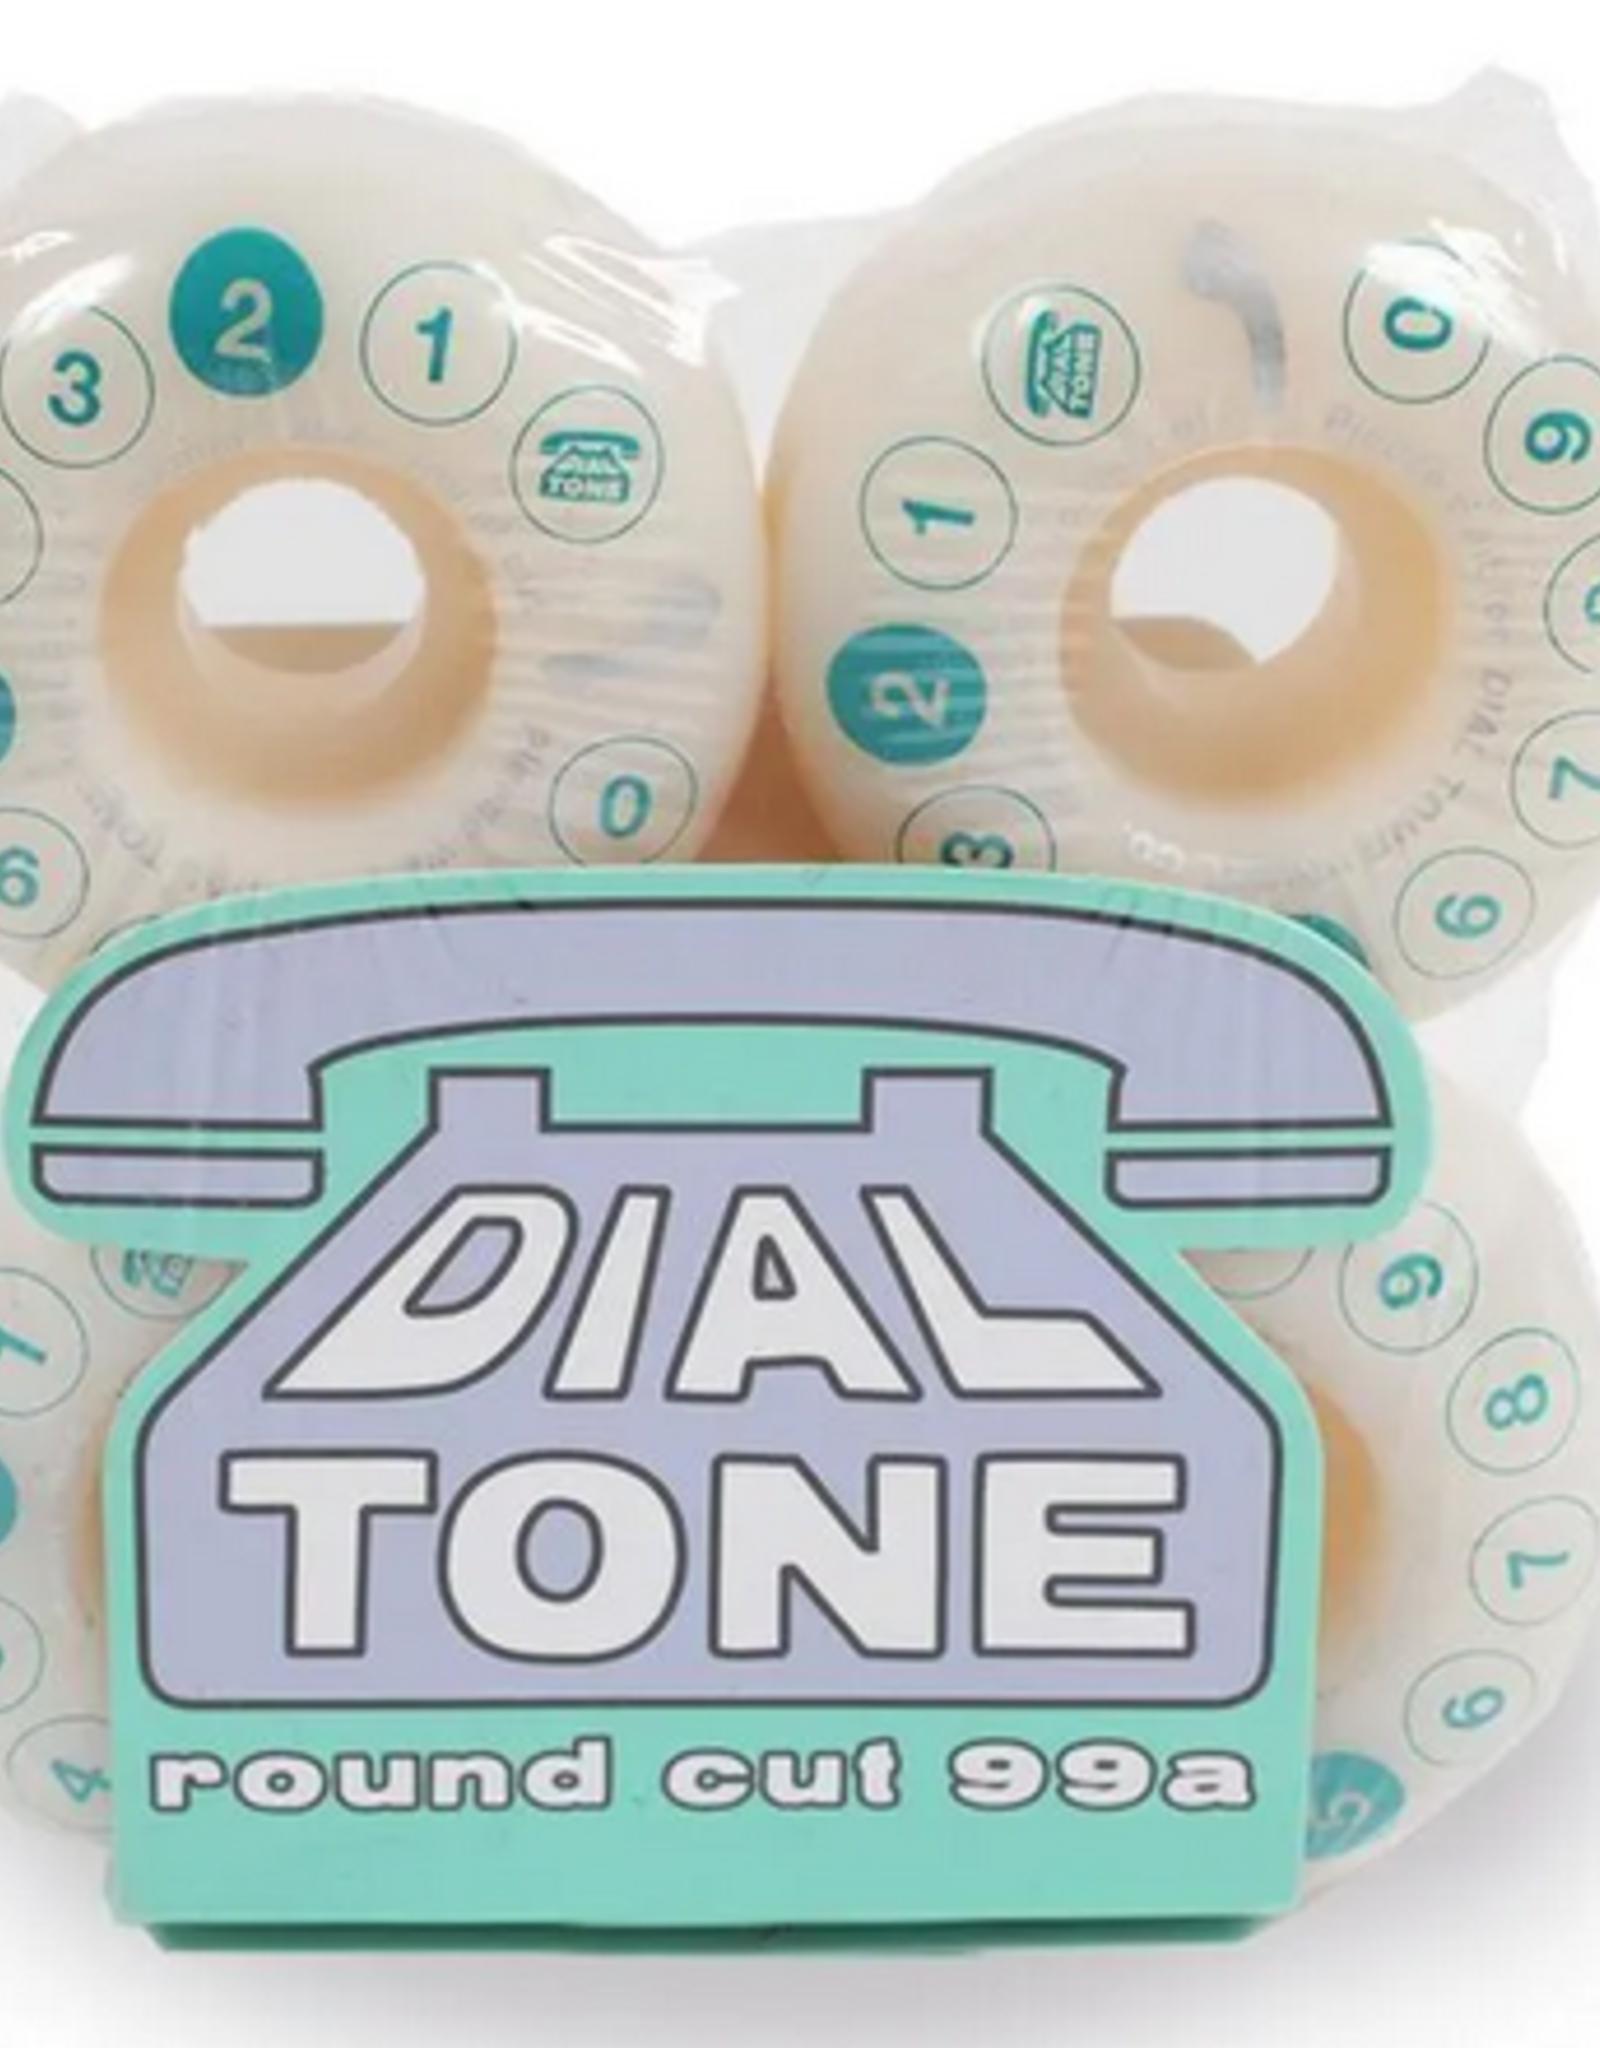 DIAL TONE DIAL TONE 52MM 99A ROTARY CLASSIC ROUND CUT WHEELS